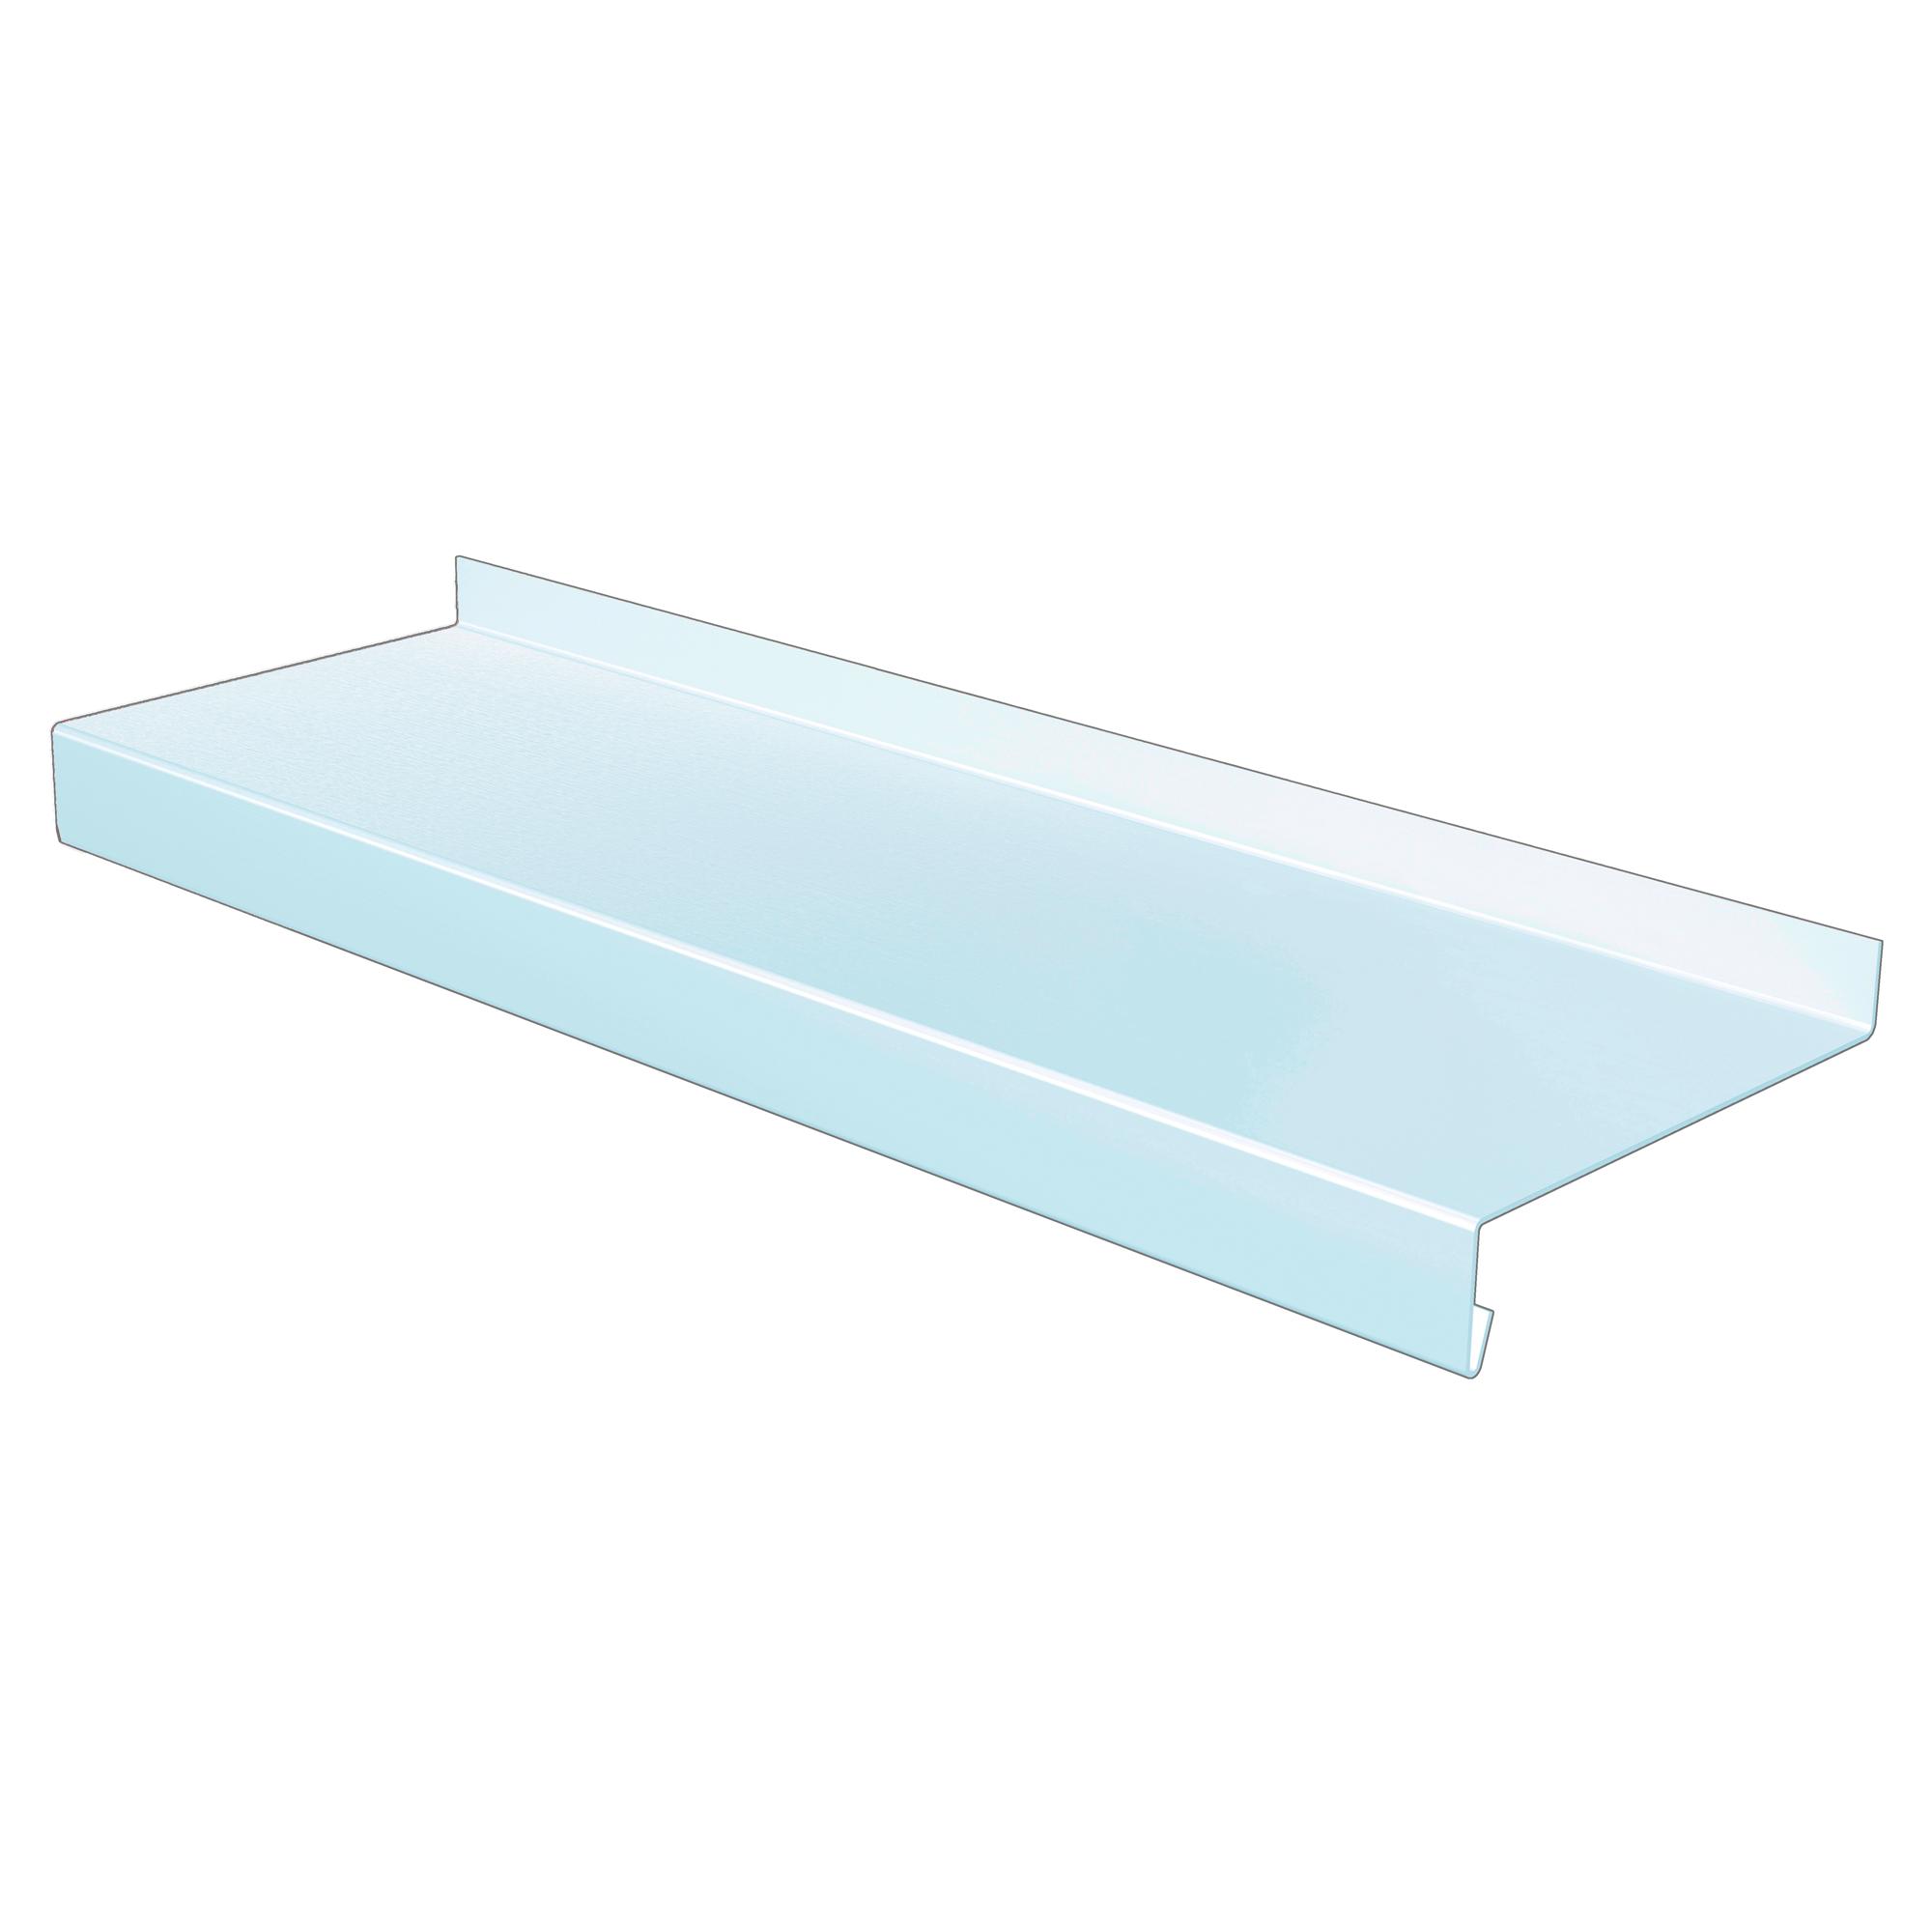 Fensterbank Aluminium weiß 300 x 0,15 x 9 cm ǀ toom Baumarkt